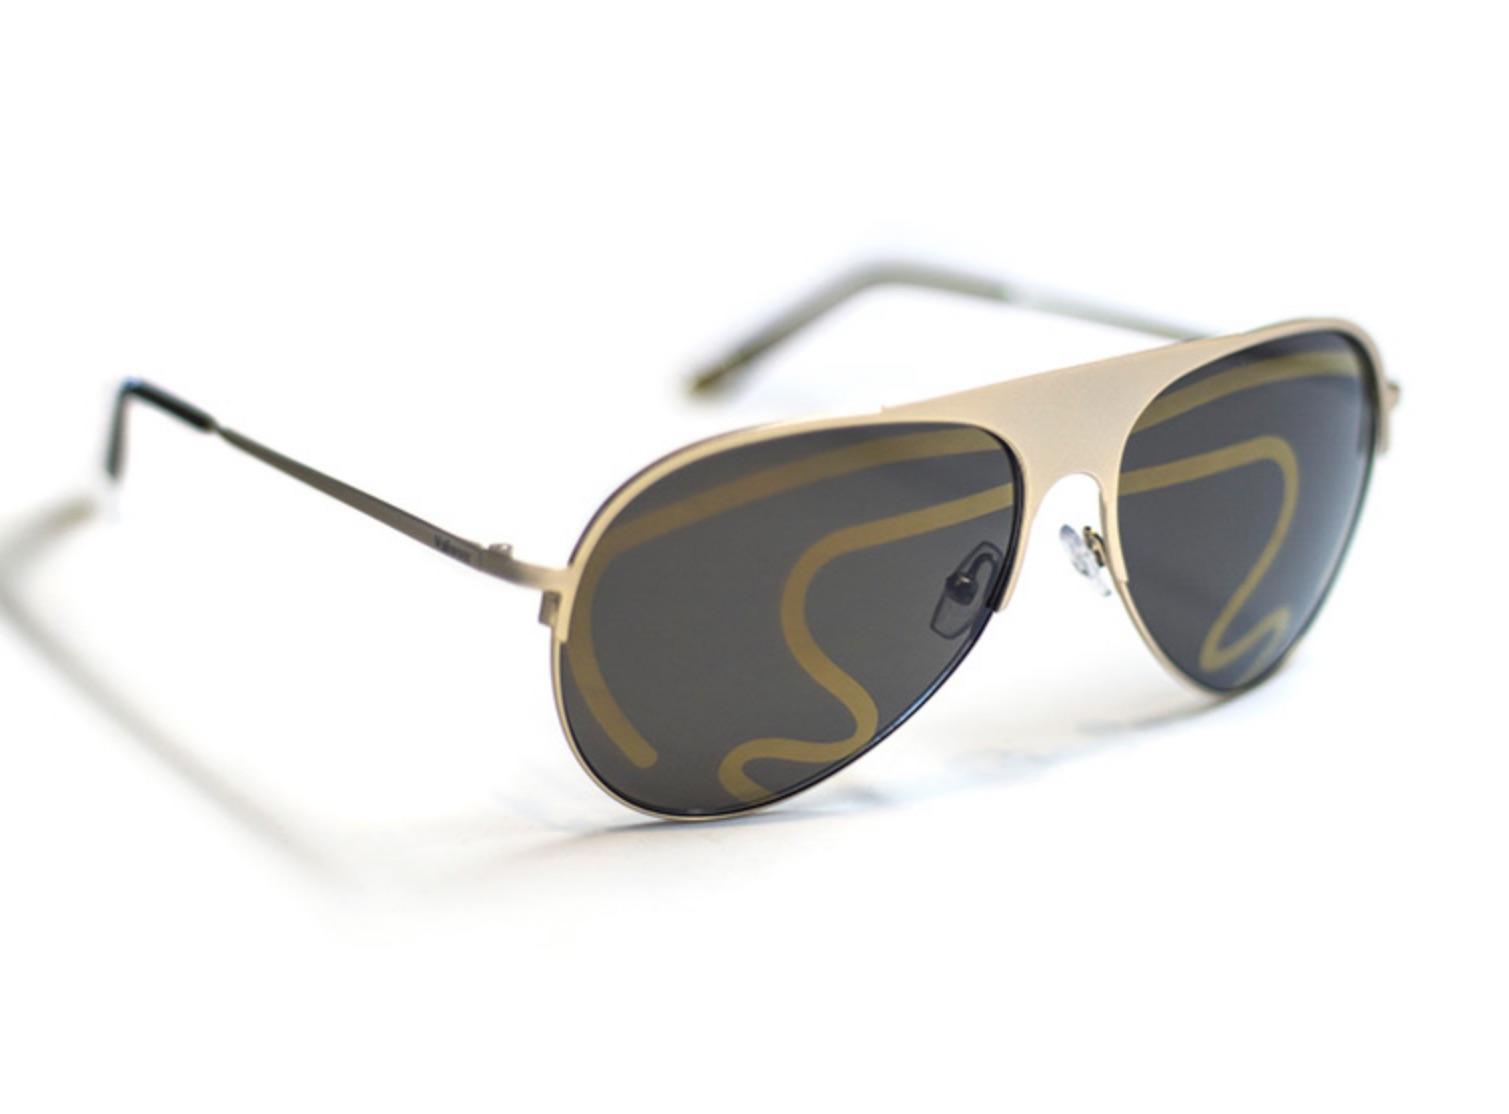 Vuliwear's Polarized Nylon lenses with mirror coating we adore